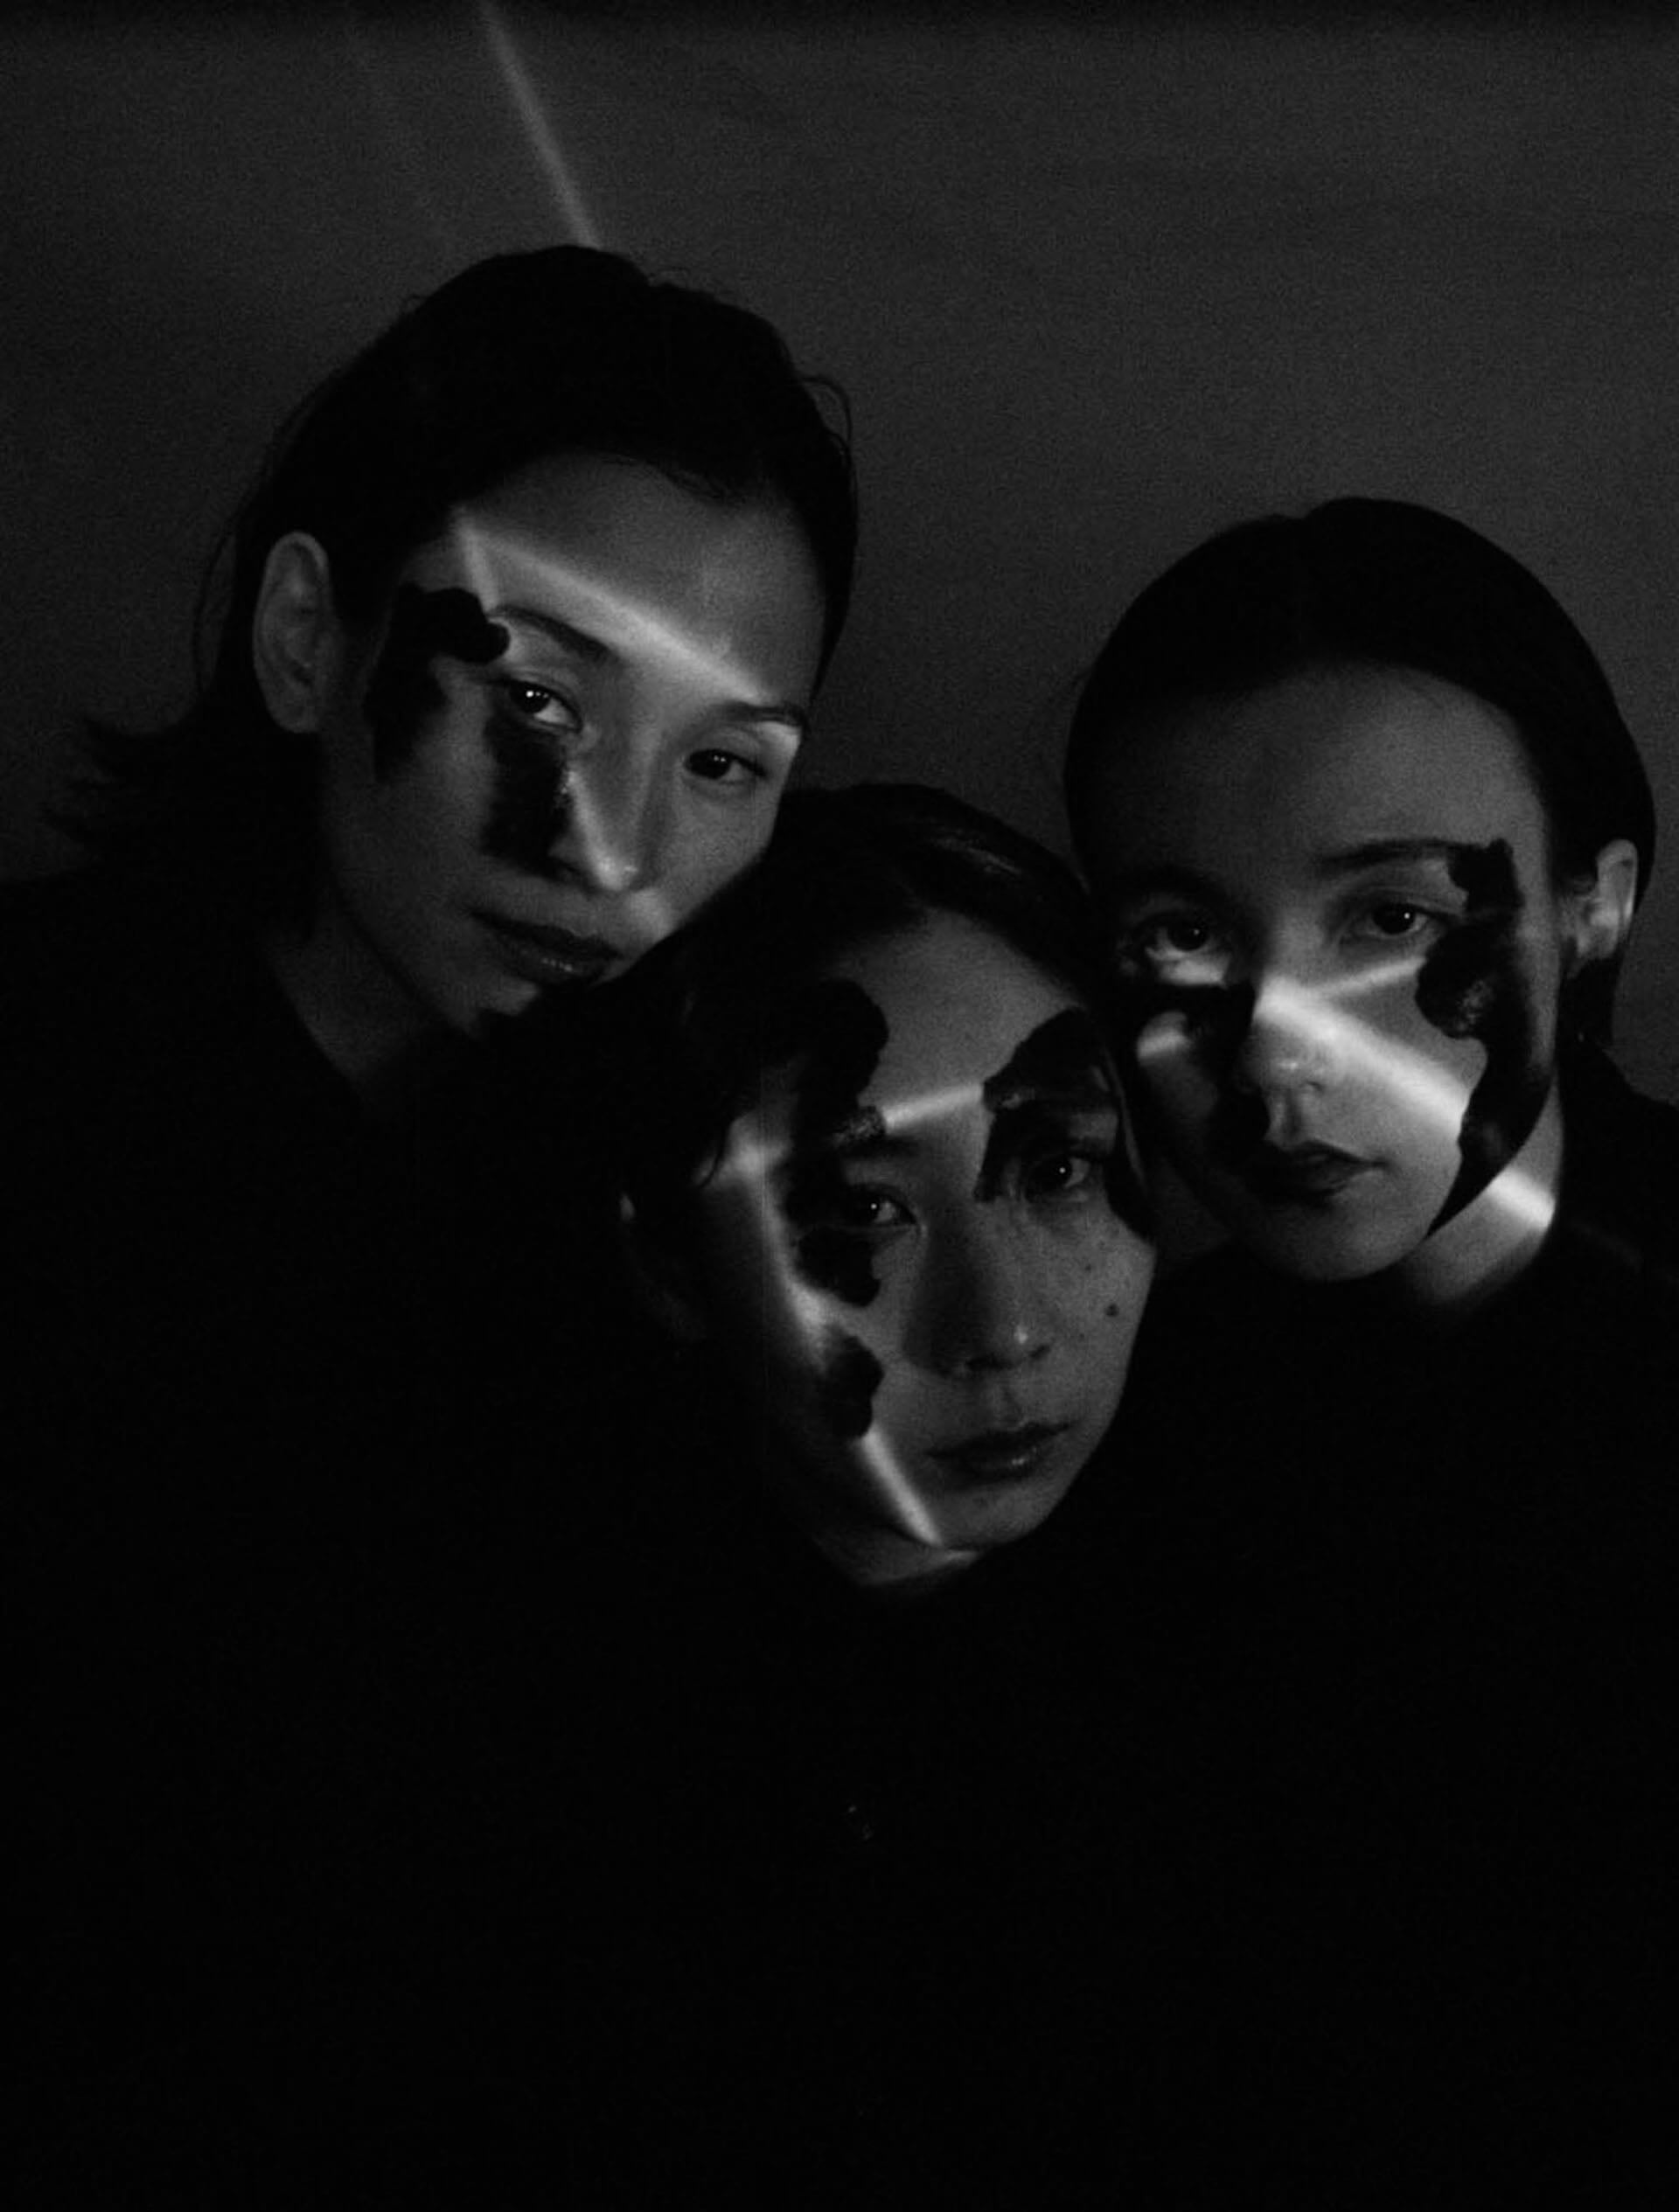 "Black Boboi初のアルバム『SILK』がリリース決定!収録曲""gd612""と""Postwar""が先行配信スタート music201028_black-boboi_2-1920x2530"